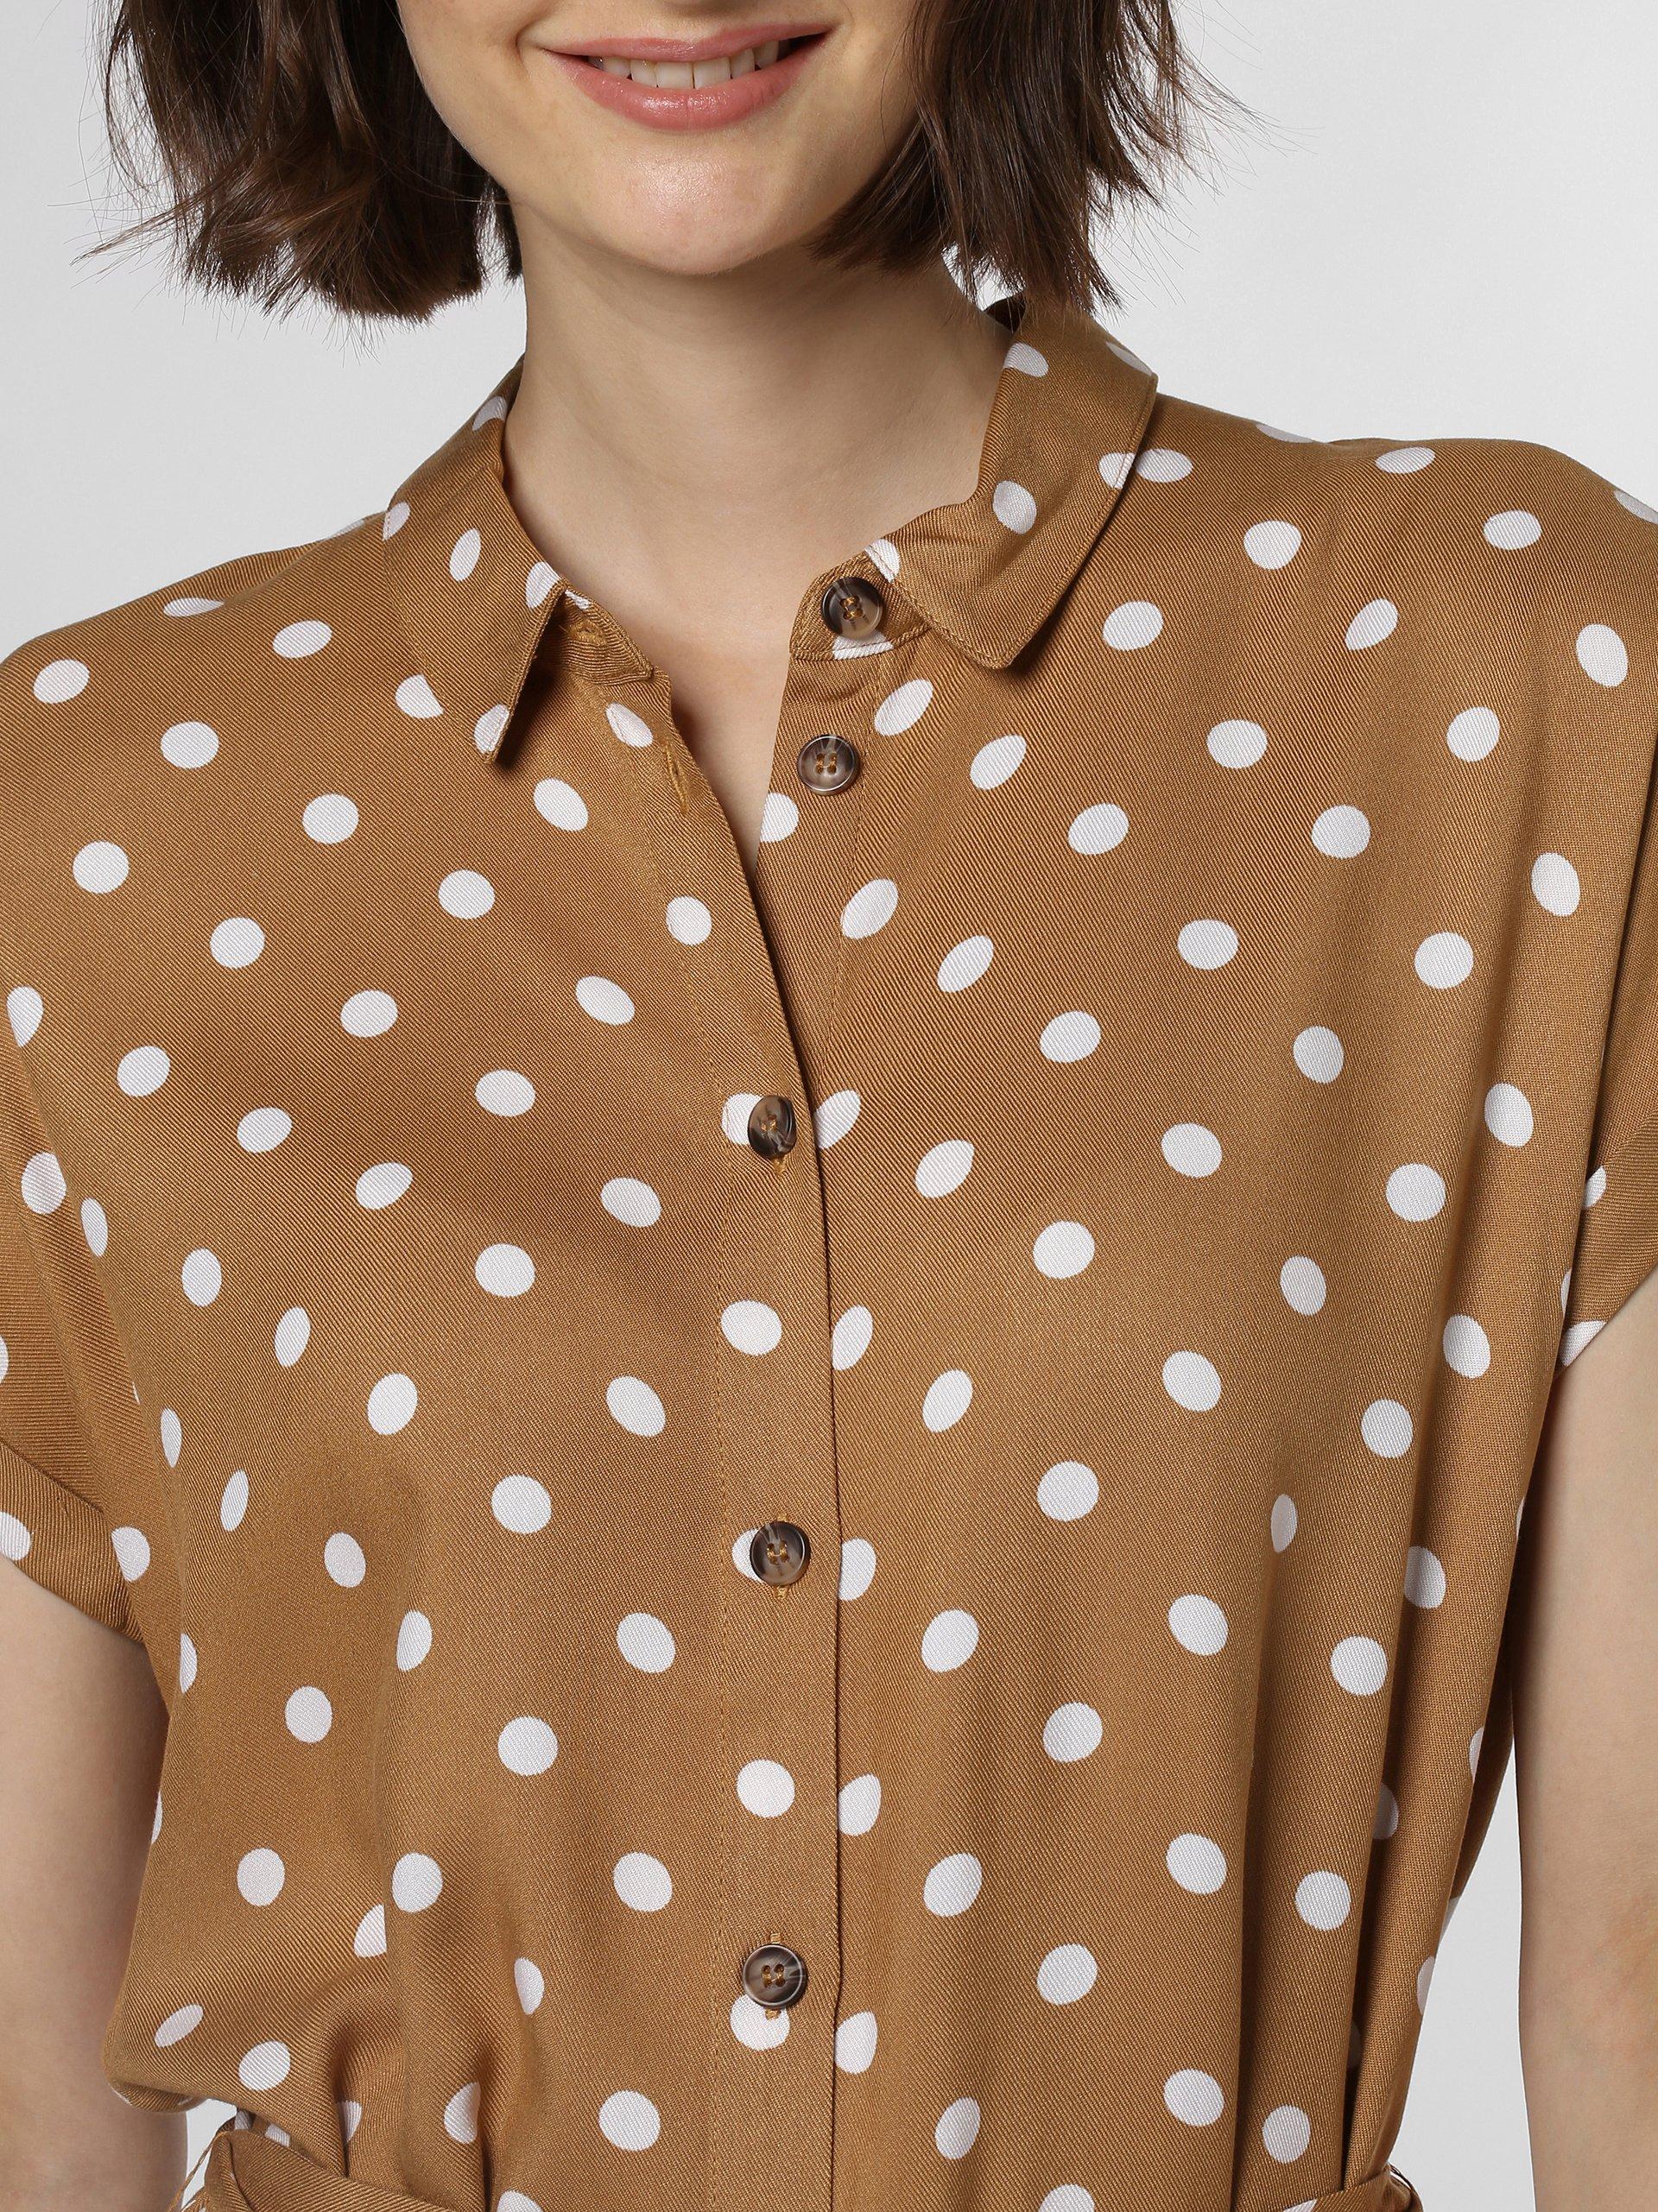 Minimum Damen Kleid - Idot